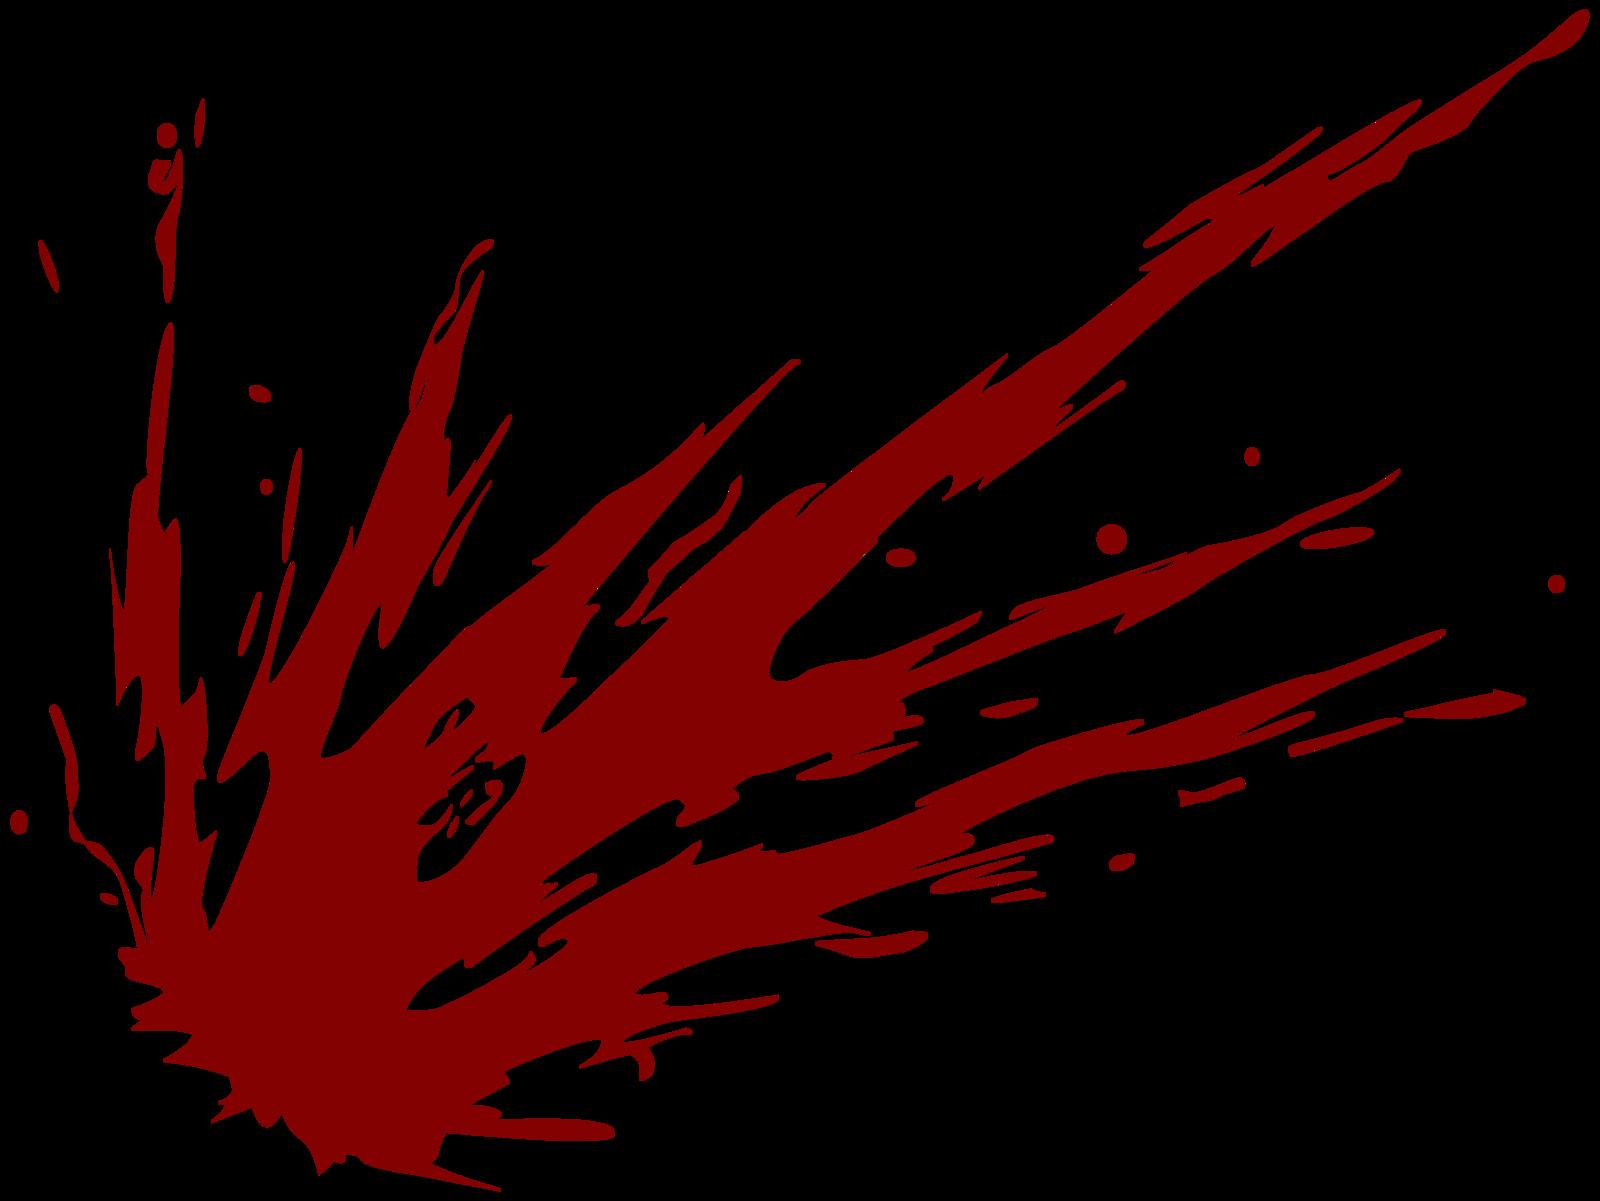 Blood splatter photo transparentpng. Earthquake clipart volcanic eruption